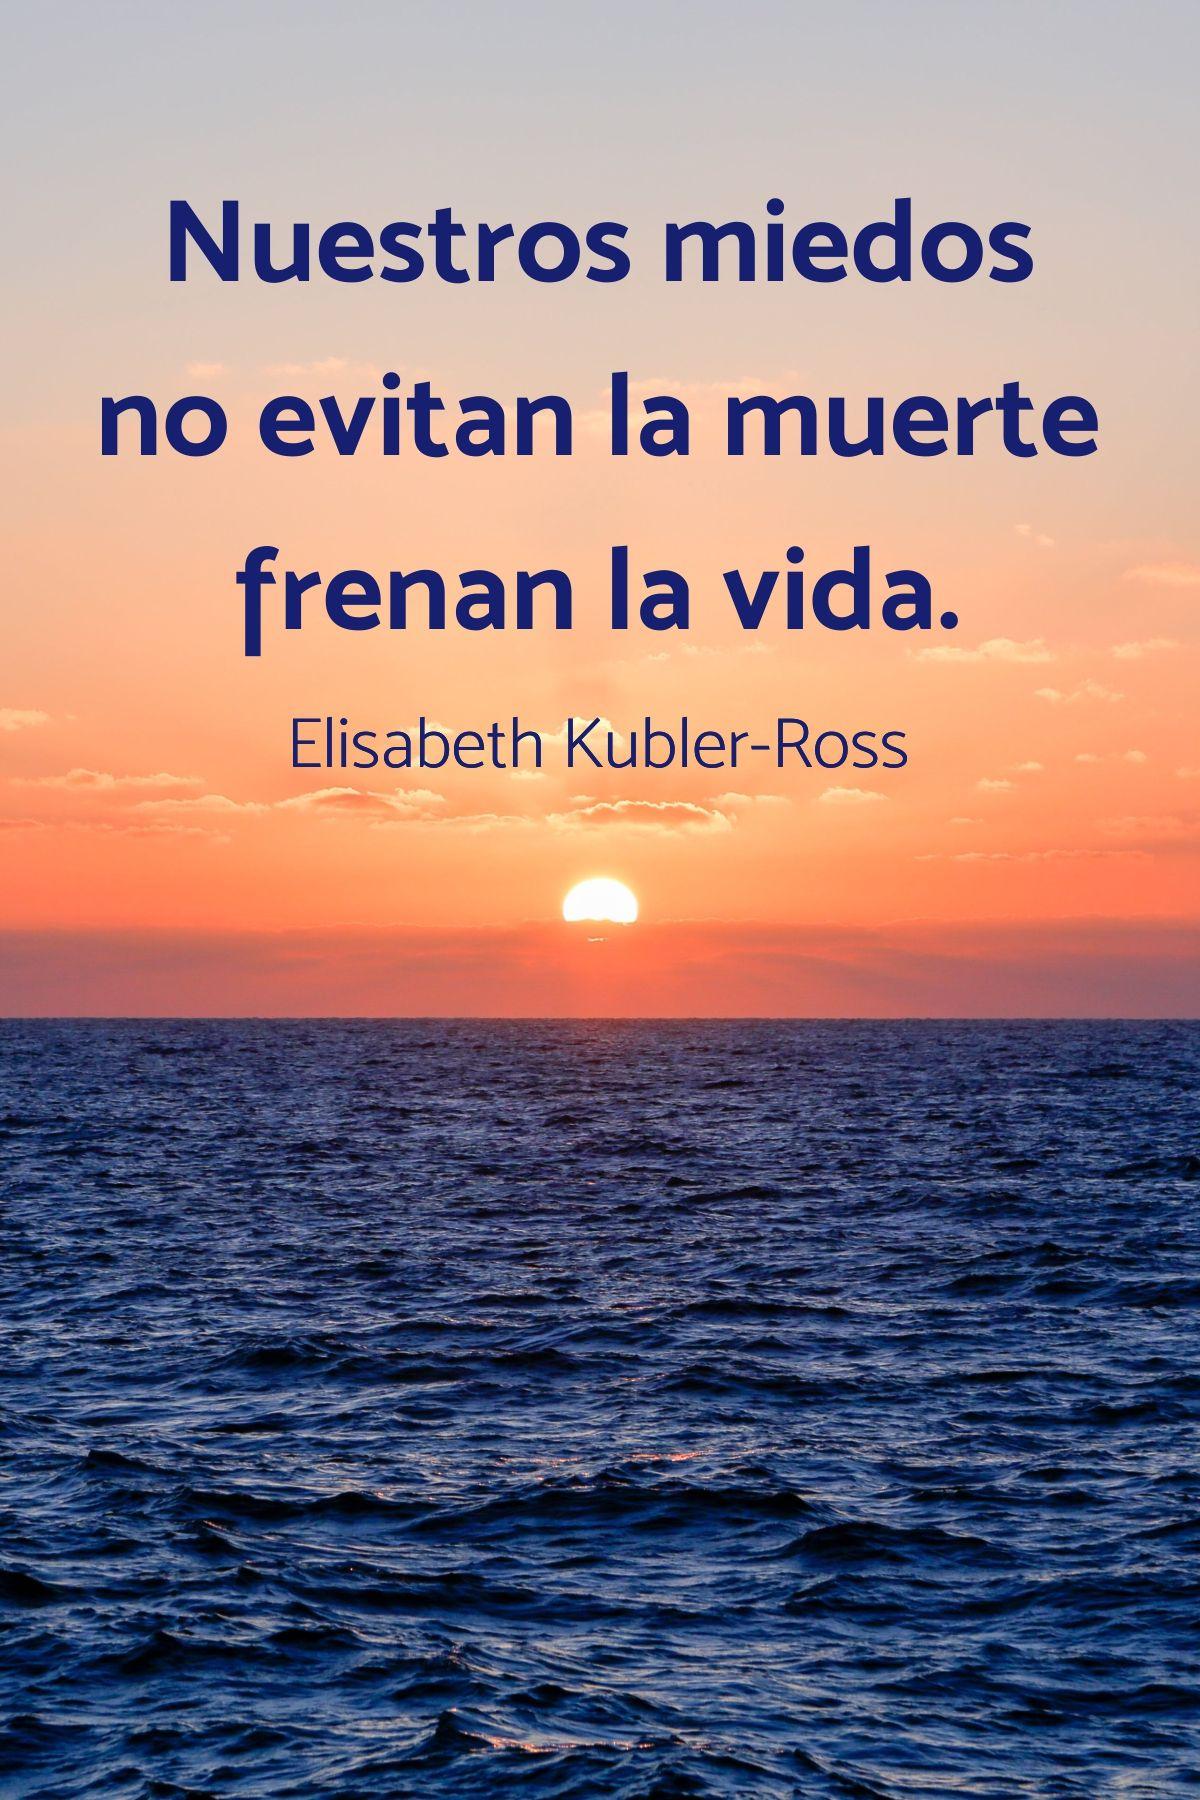 Nuestros Miedos Elisabeth Kubler Ross Frases Frases De La Vida Frases Elisabeth Kubler Ross